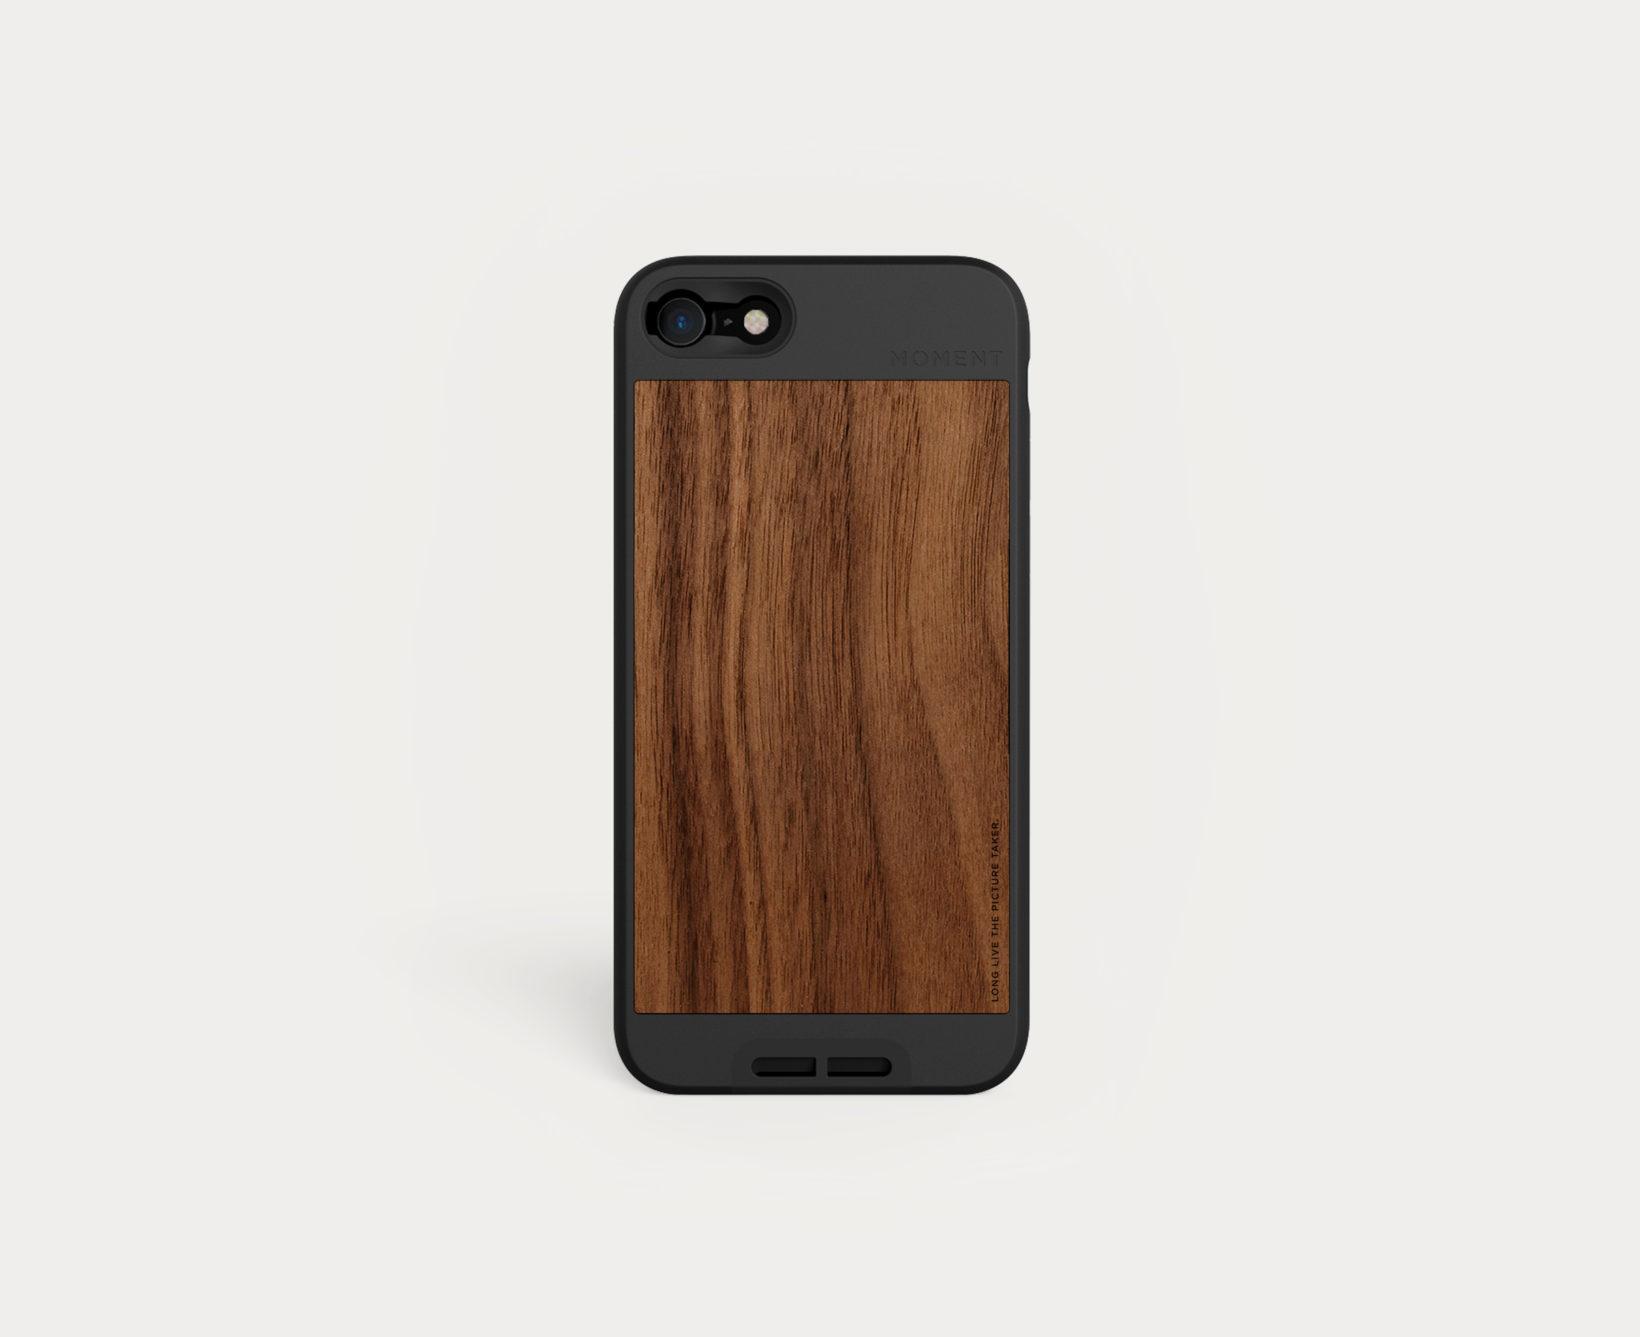 reputable site 8767a 9a236 iPhone Photo Case | iPhone 8 / iPhone 7 - Walnut Wood